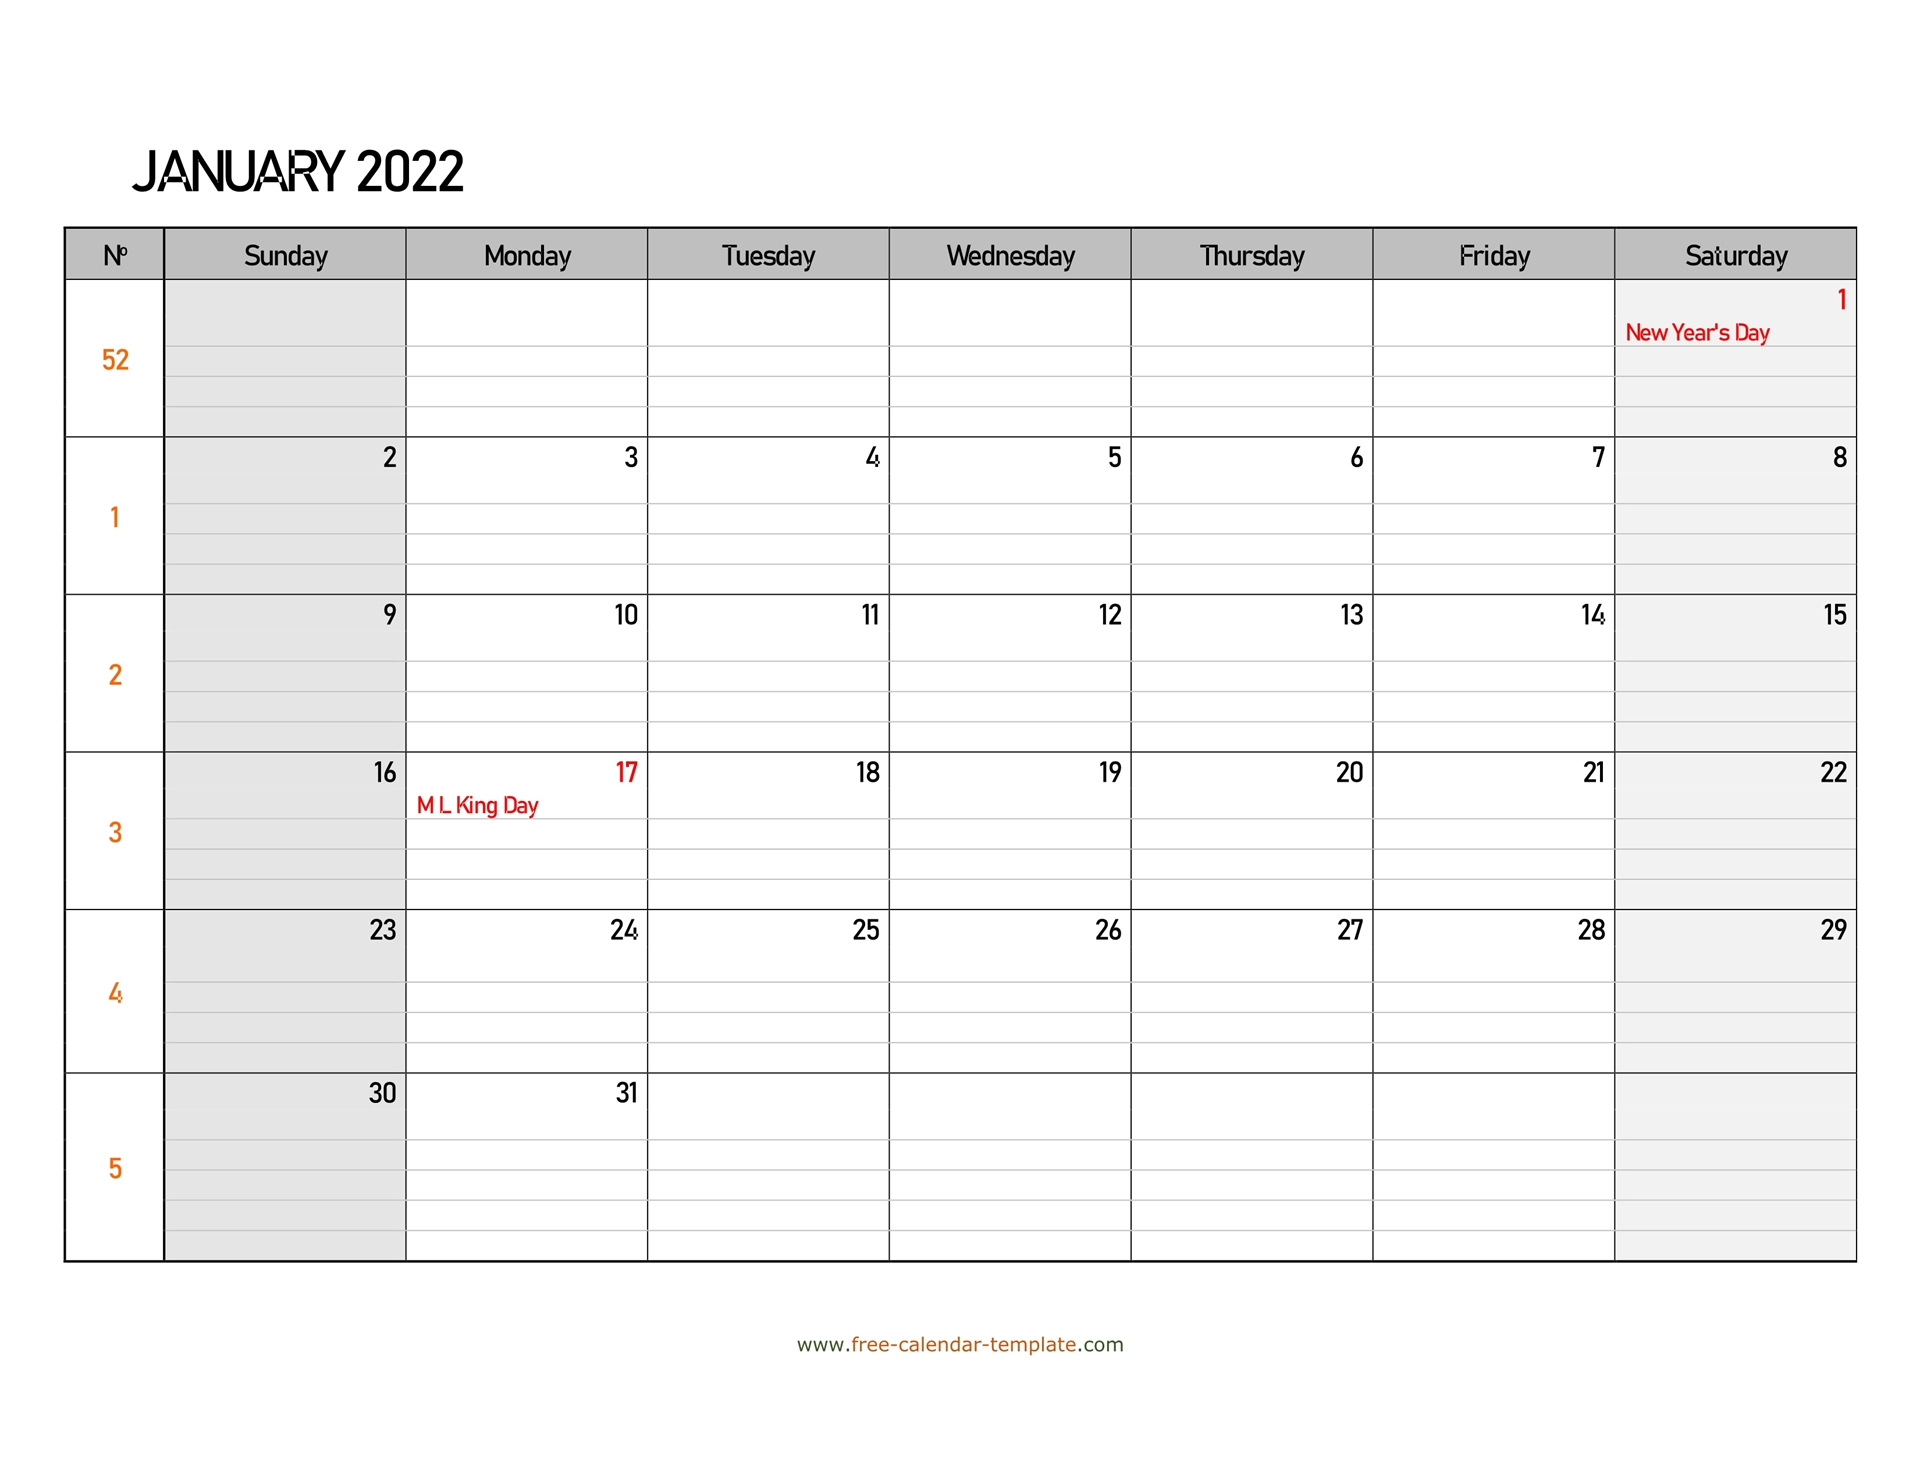 January 2022 Calendar Free Printable With Grid Lines Within Printable January 2022 Calendar